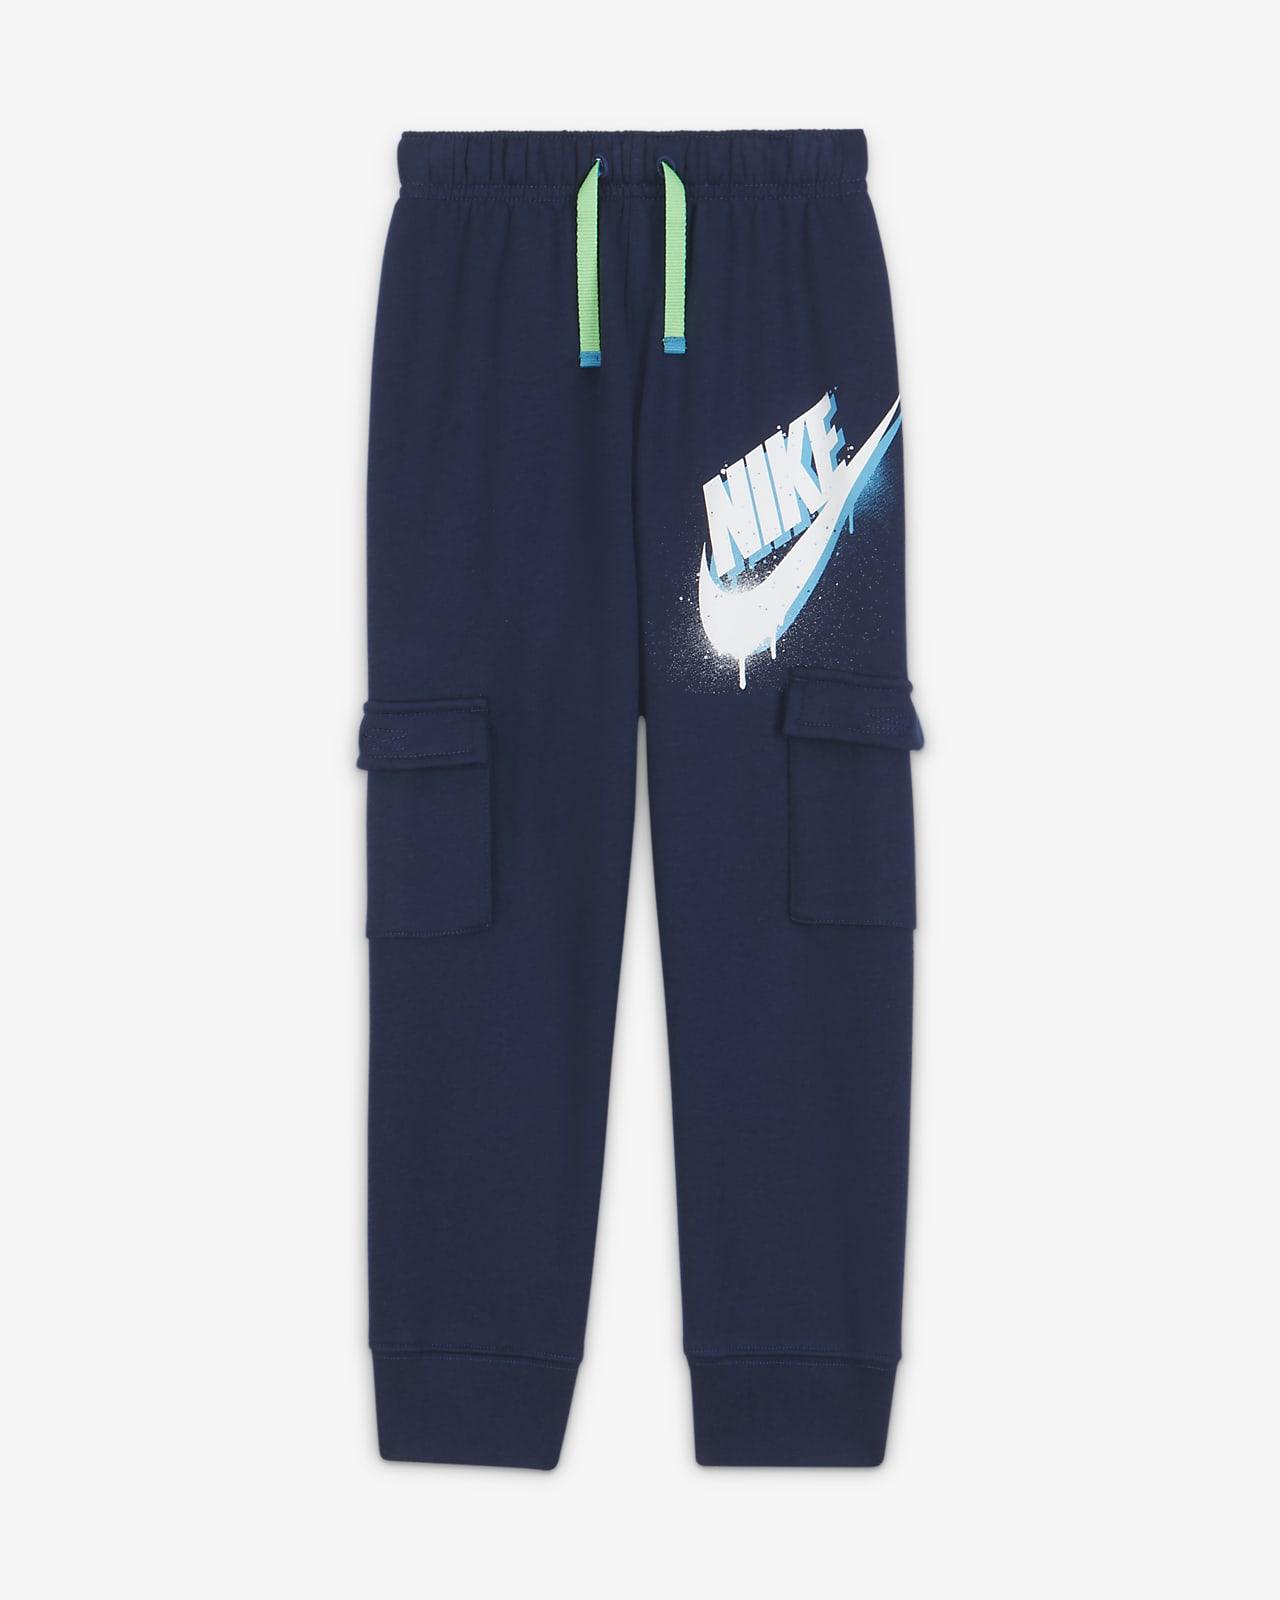 Nike Little Kids' Cargo Joggers. Nike.com